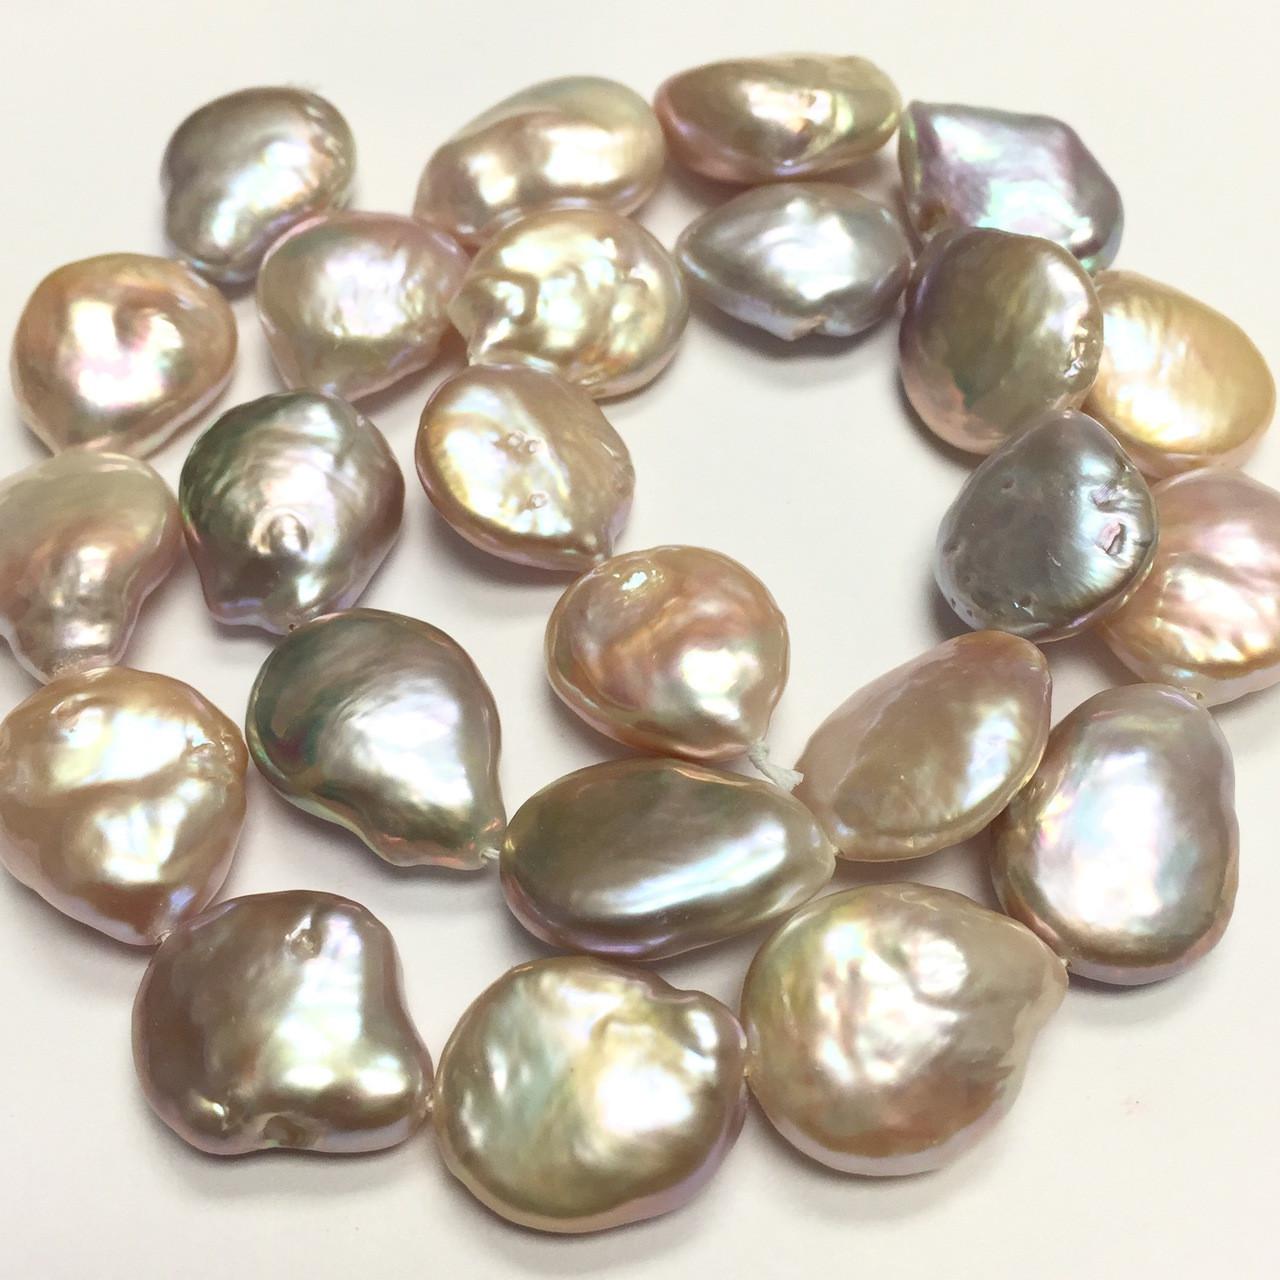 45f68794cdc61 Peachy Baroque Coin Pearls 14-15mm